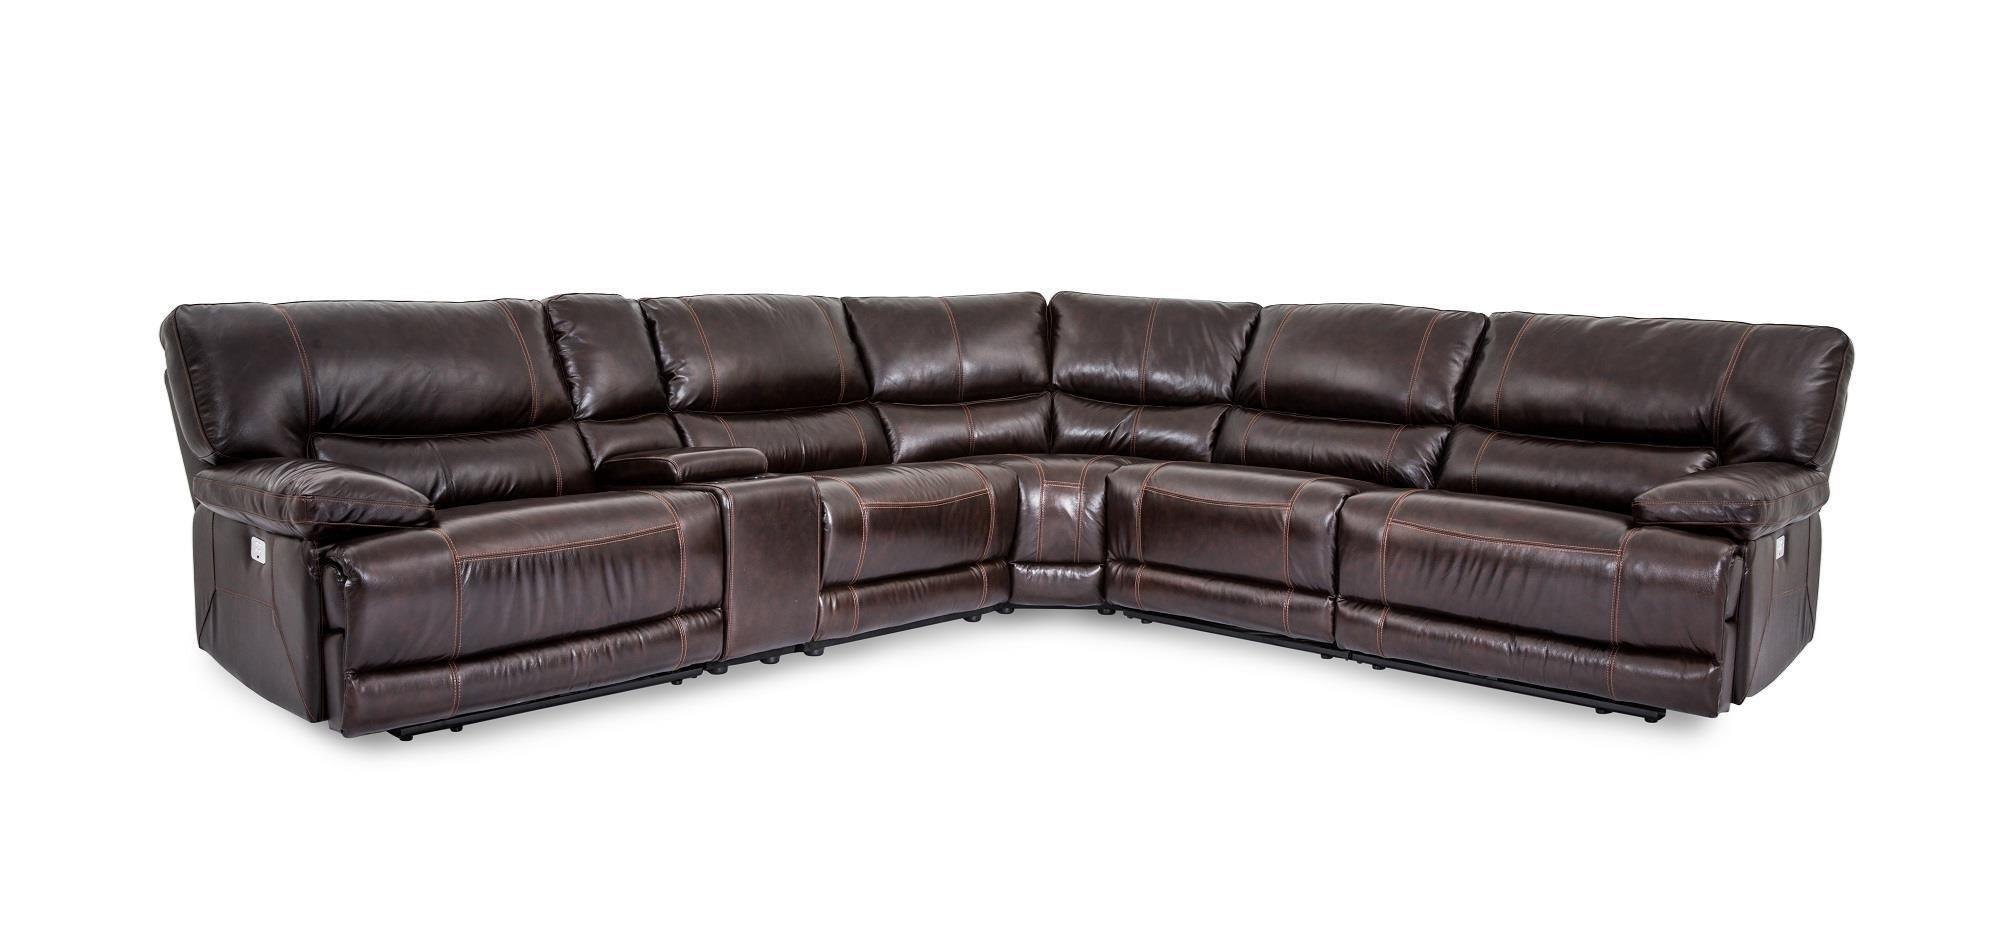 cheers sofa x9509m x9509m collins leather power reclining 6 piece rh dunkandbright com 6 piece faux pu leather sectional reclining sofa pirello 6-pc. leather sectional sofa